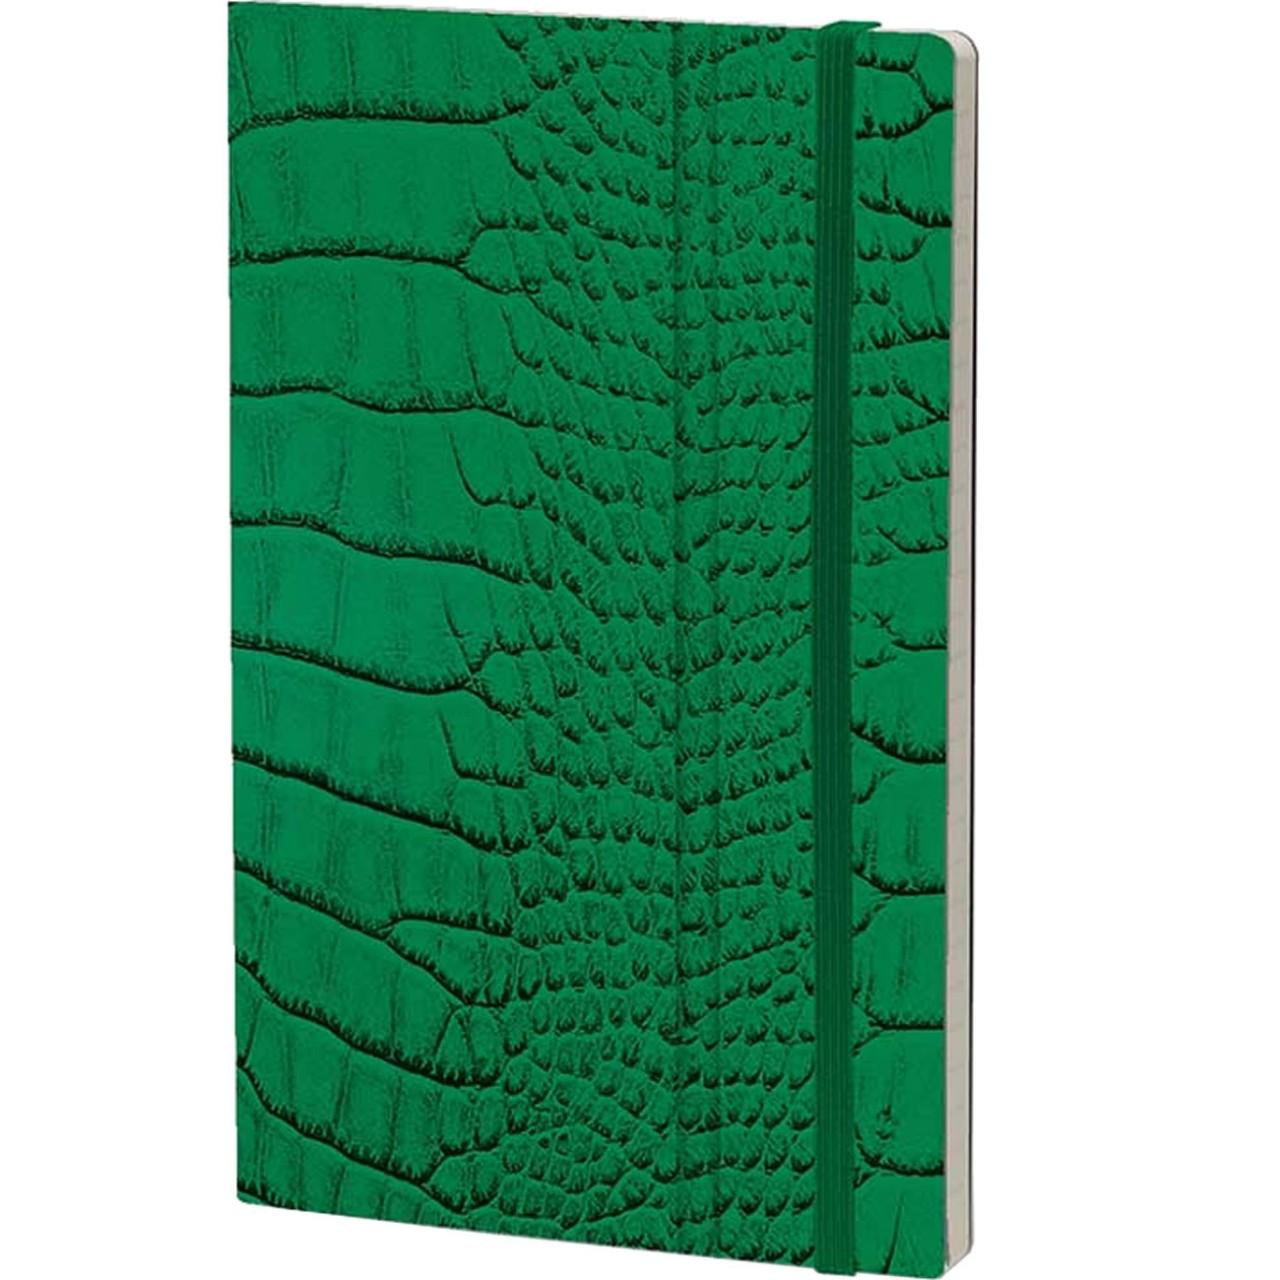 Stifflexible Notizbuch MRS CROCODILE 13 x 21 cm 192 S., GREEN